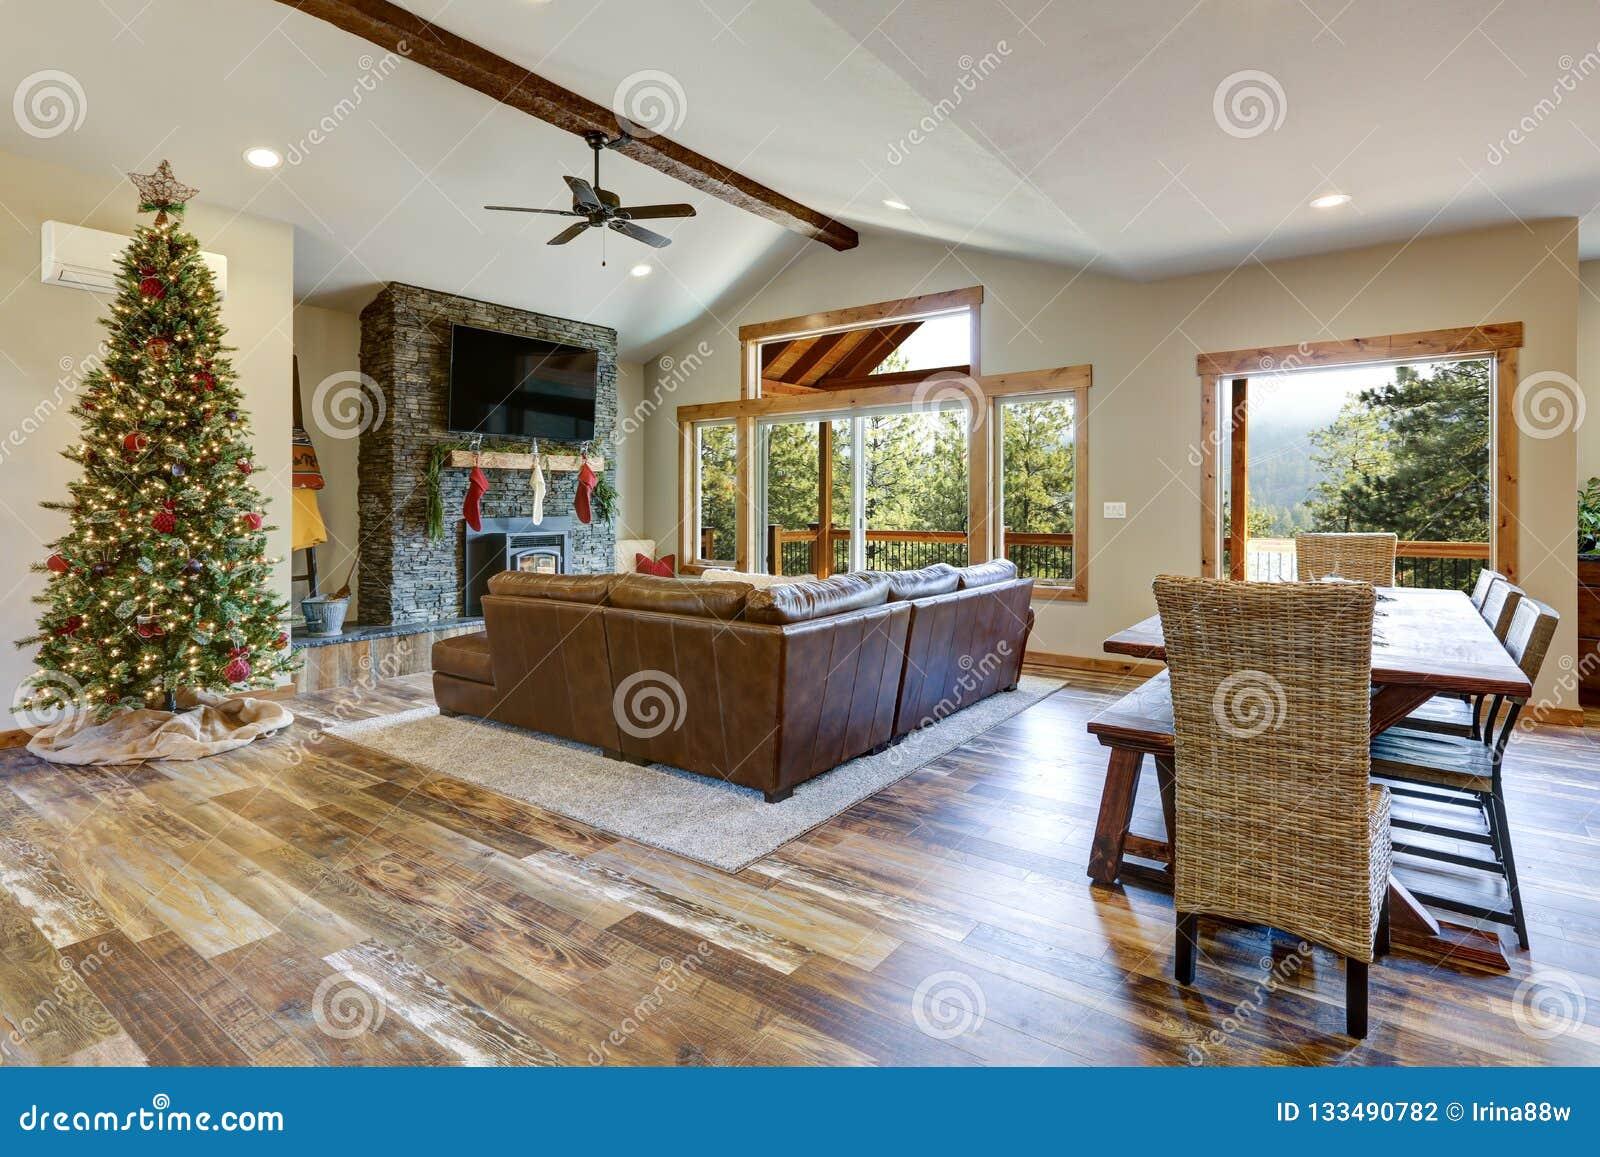 Living Room Interior With Christmas Decor Stock Photo ...